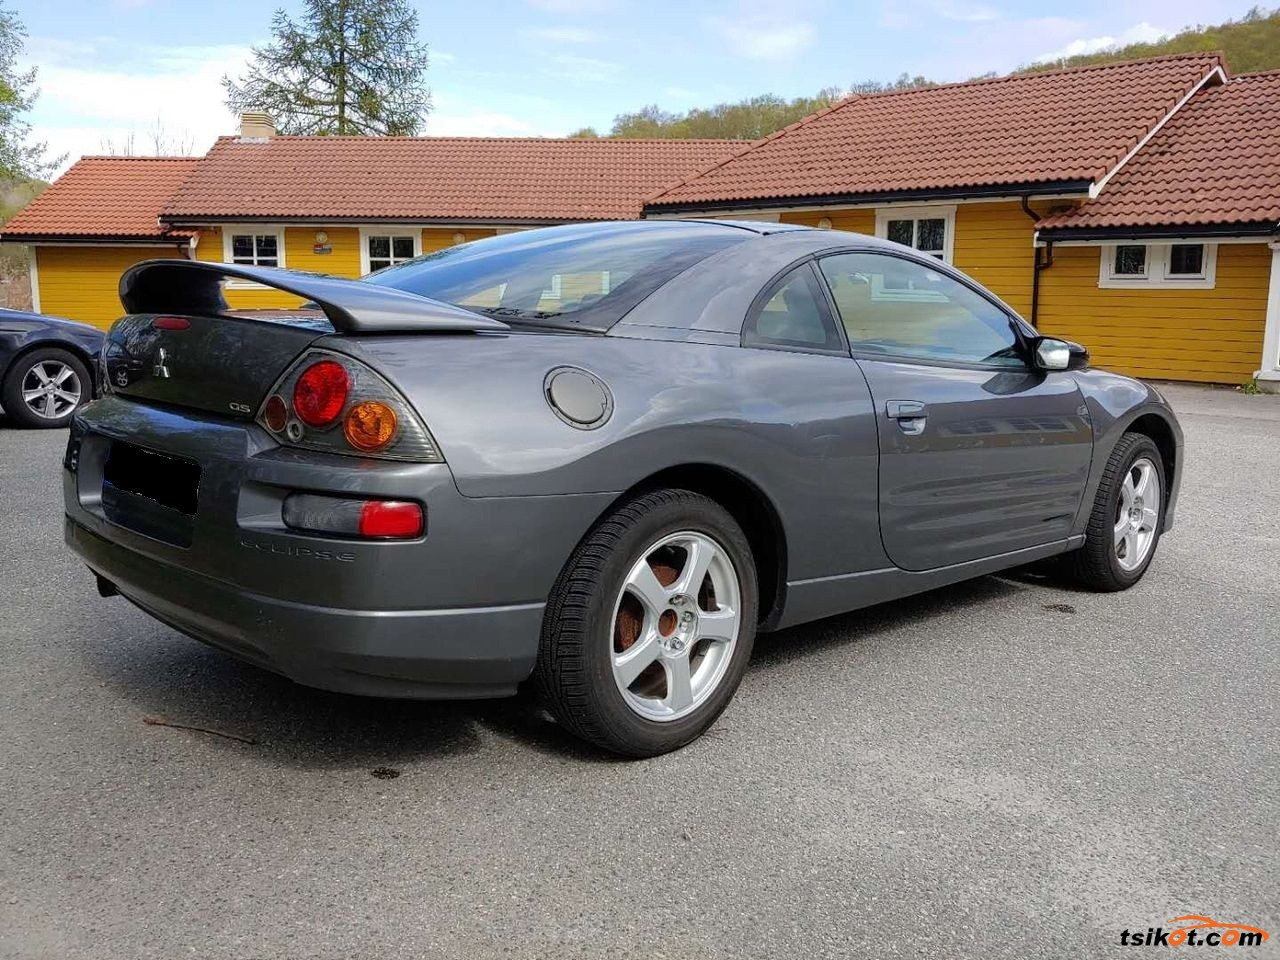 Mitsubishi Eclipse 2003 - 4